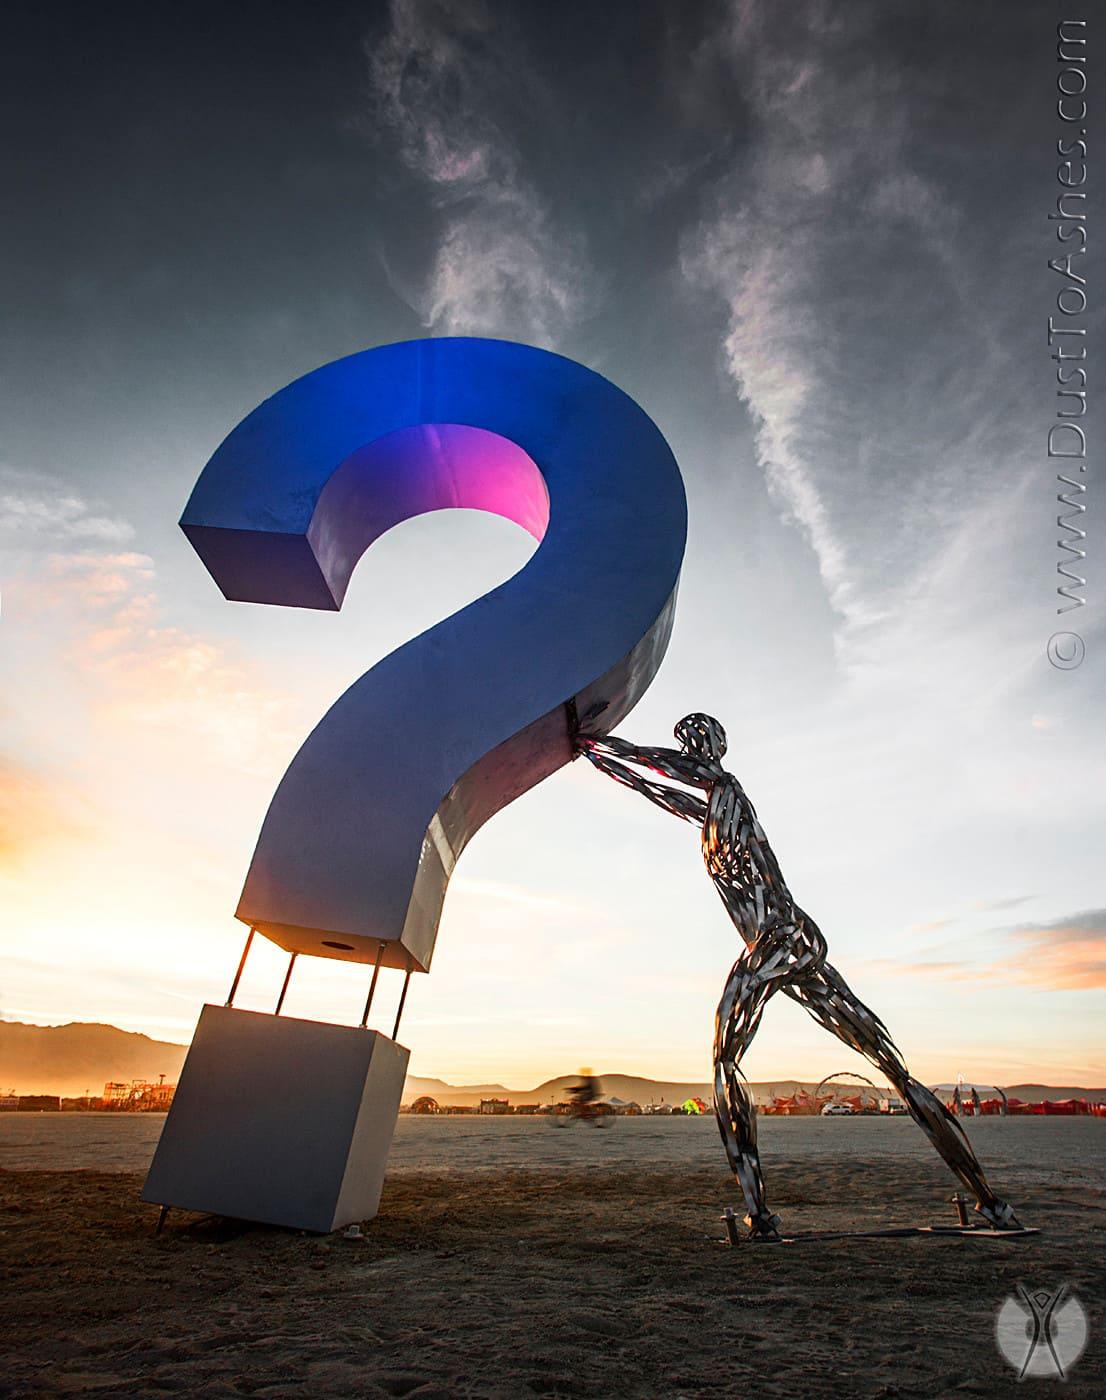 Sculpture of a man holding a sculpture of a question mark